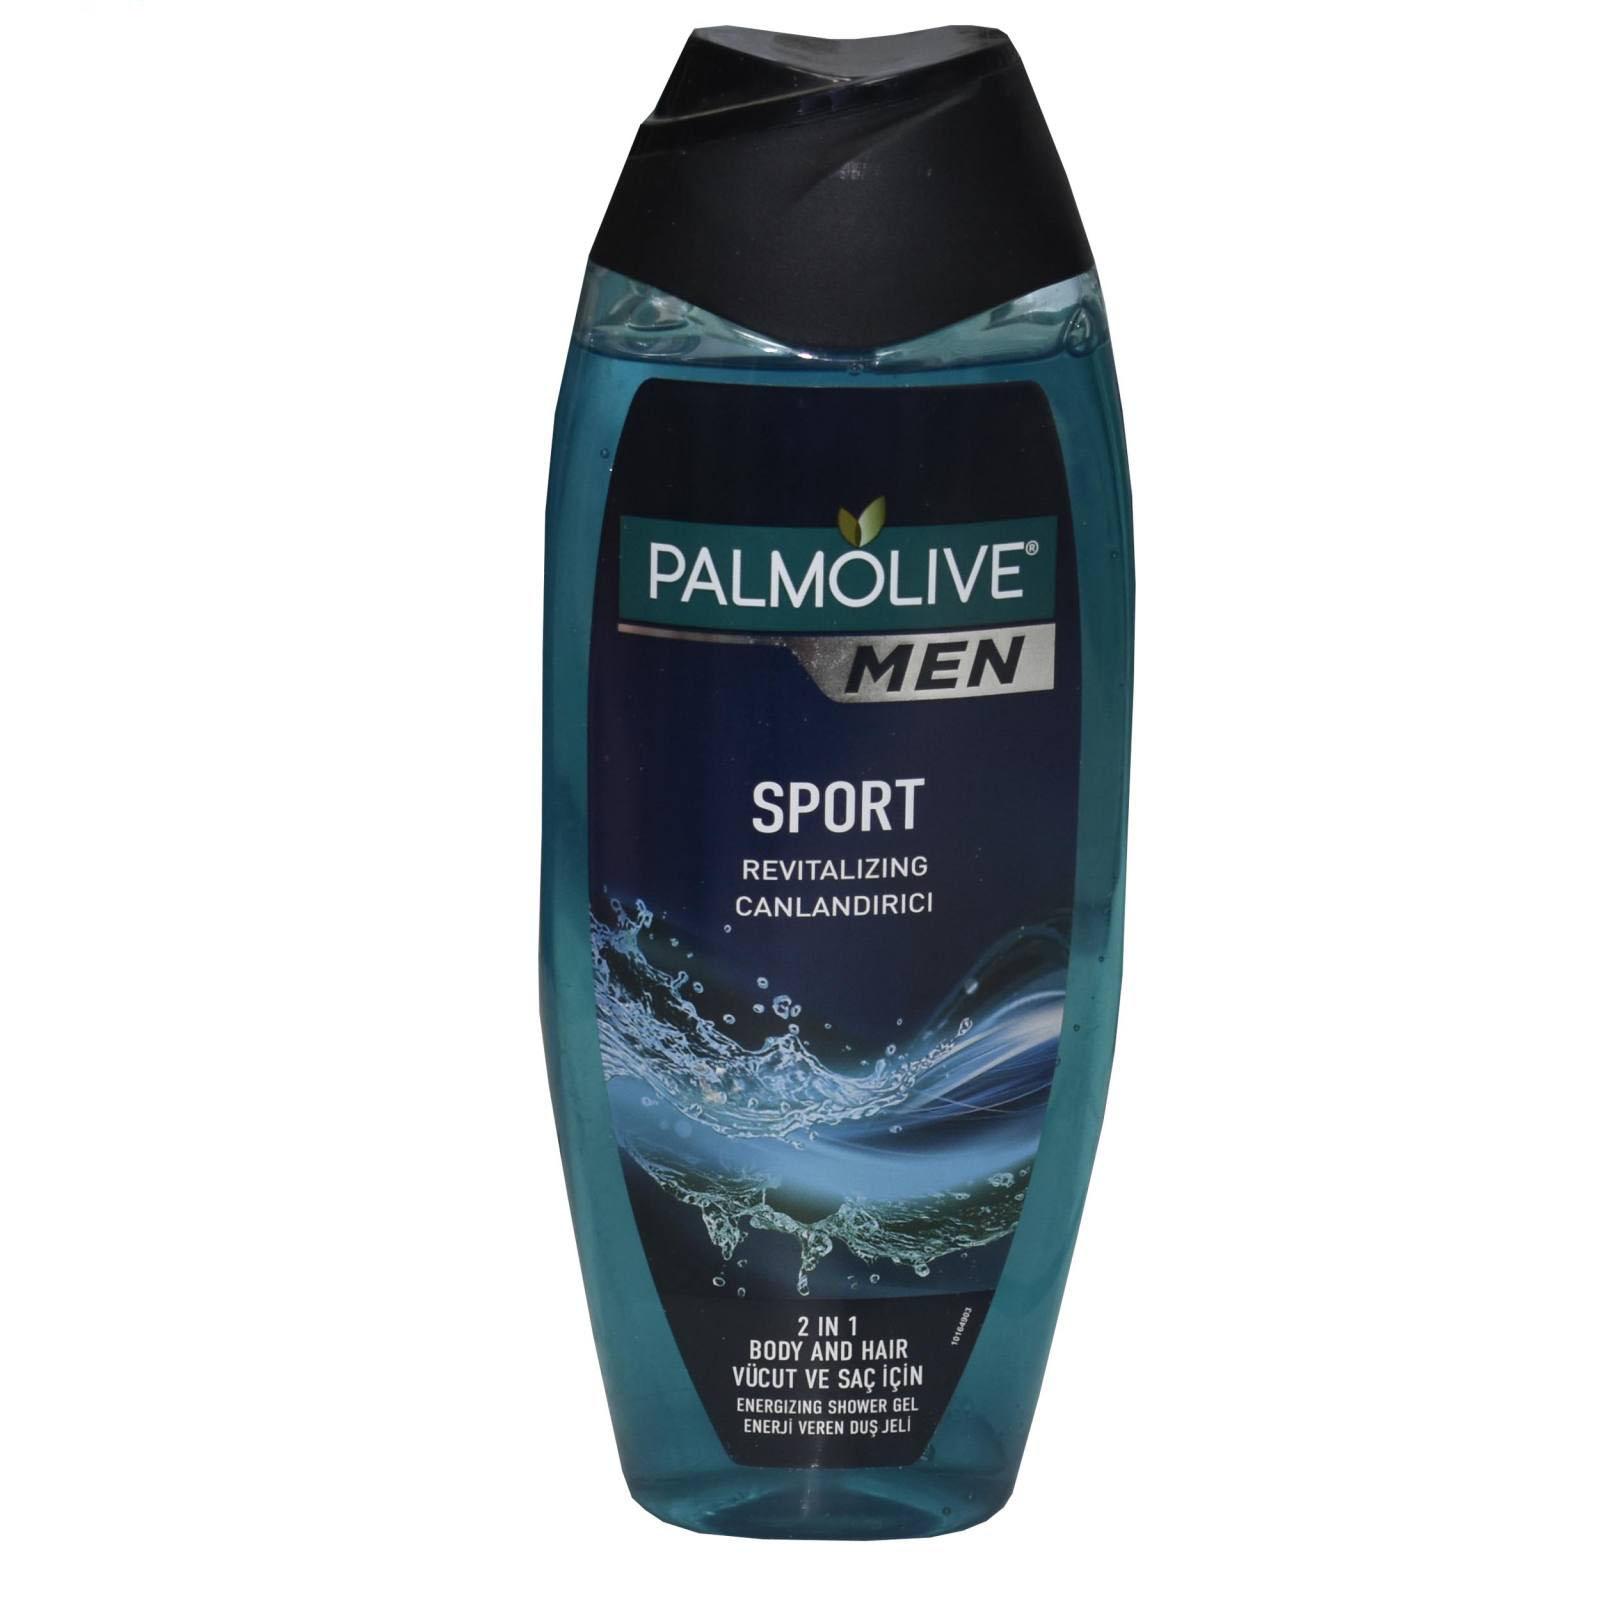 شامپو مو و بدن پالمولیو مدل Sport حجم ۵۰۰ میلی لیتر